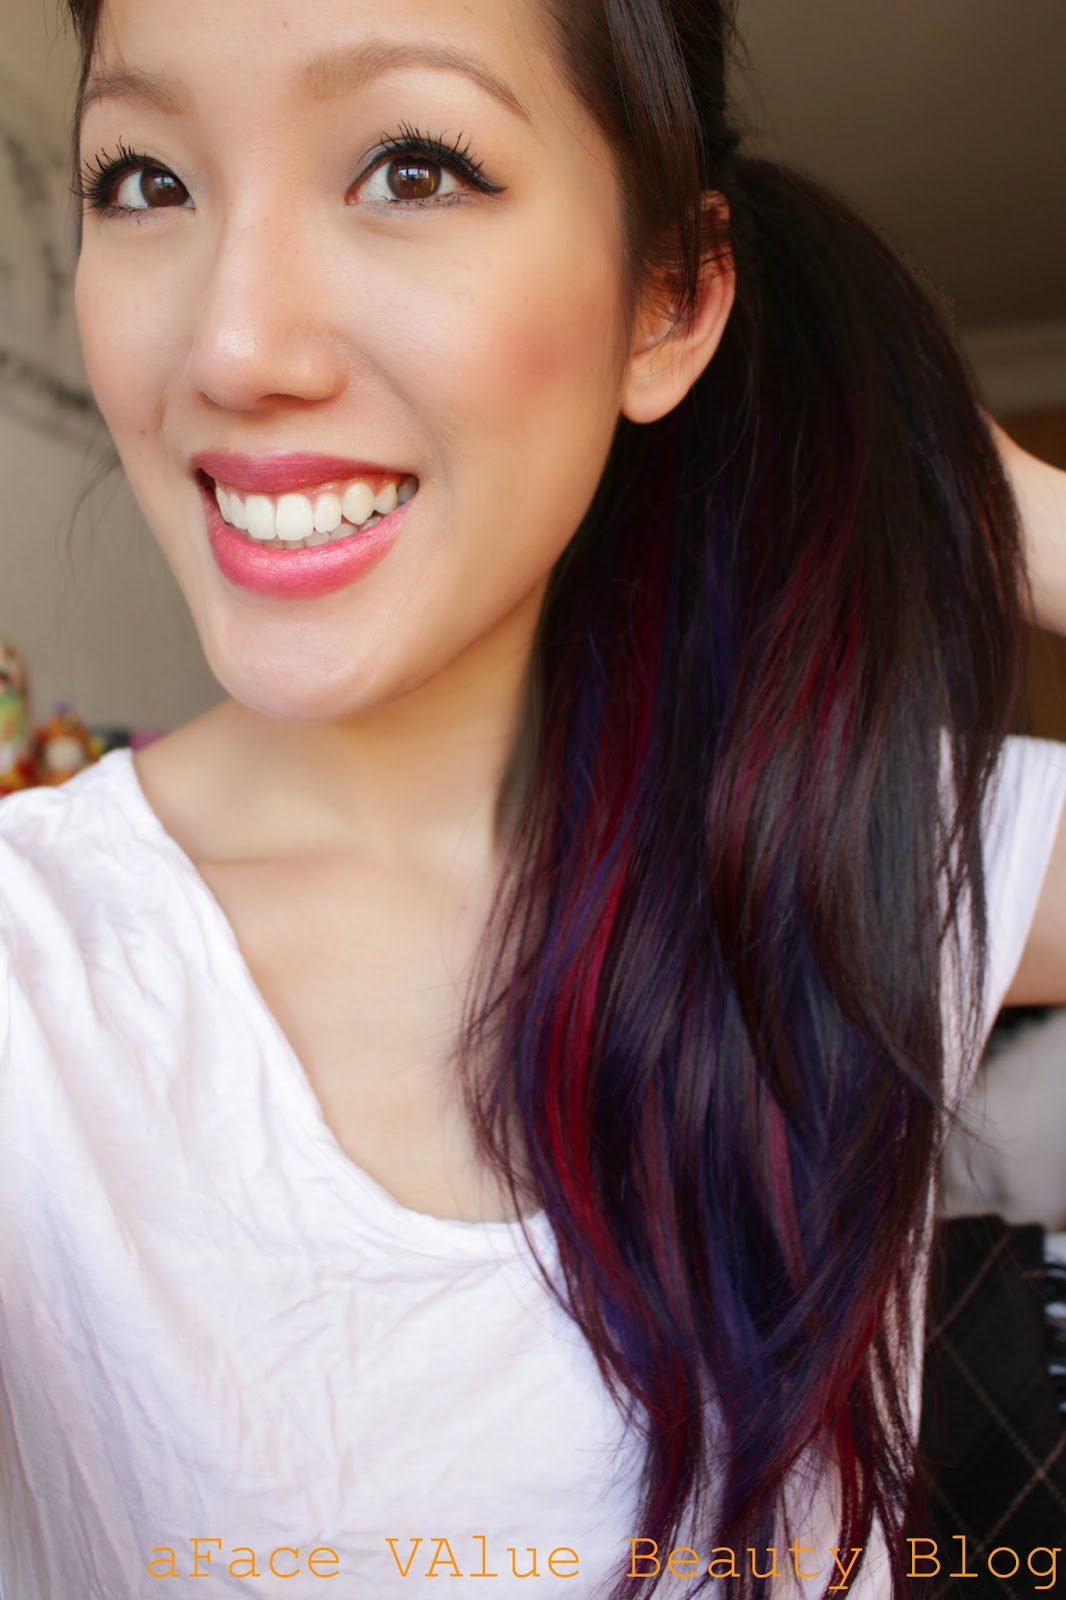 My Quest For Purple Hair Via Bleach London Zoe Bayliss Wong